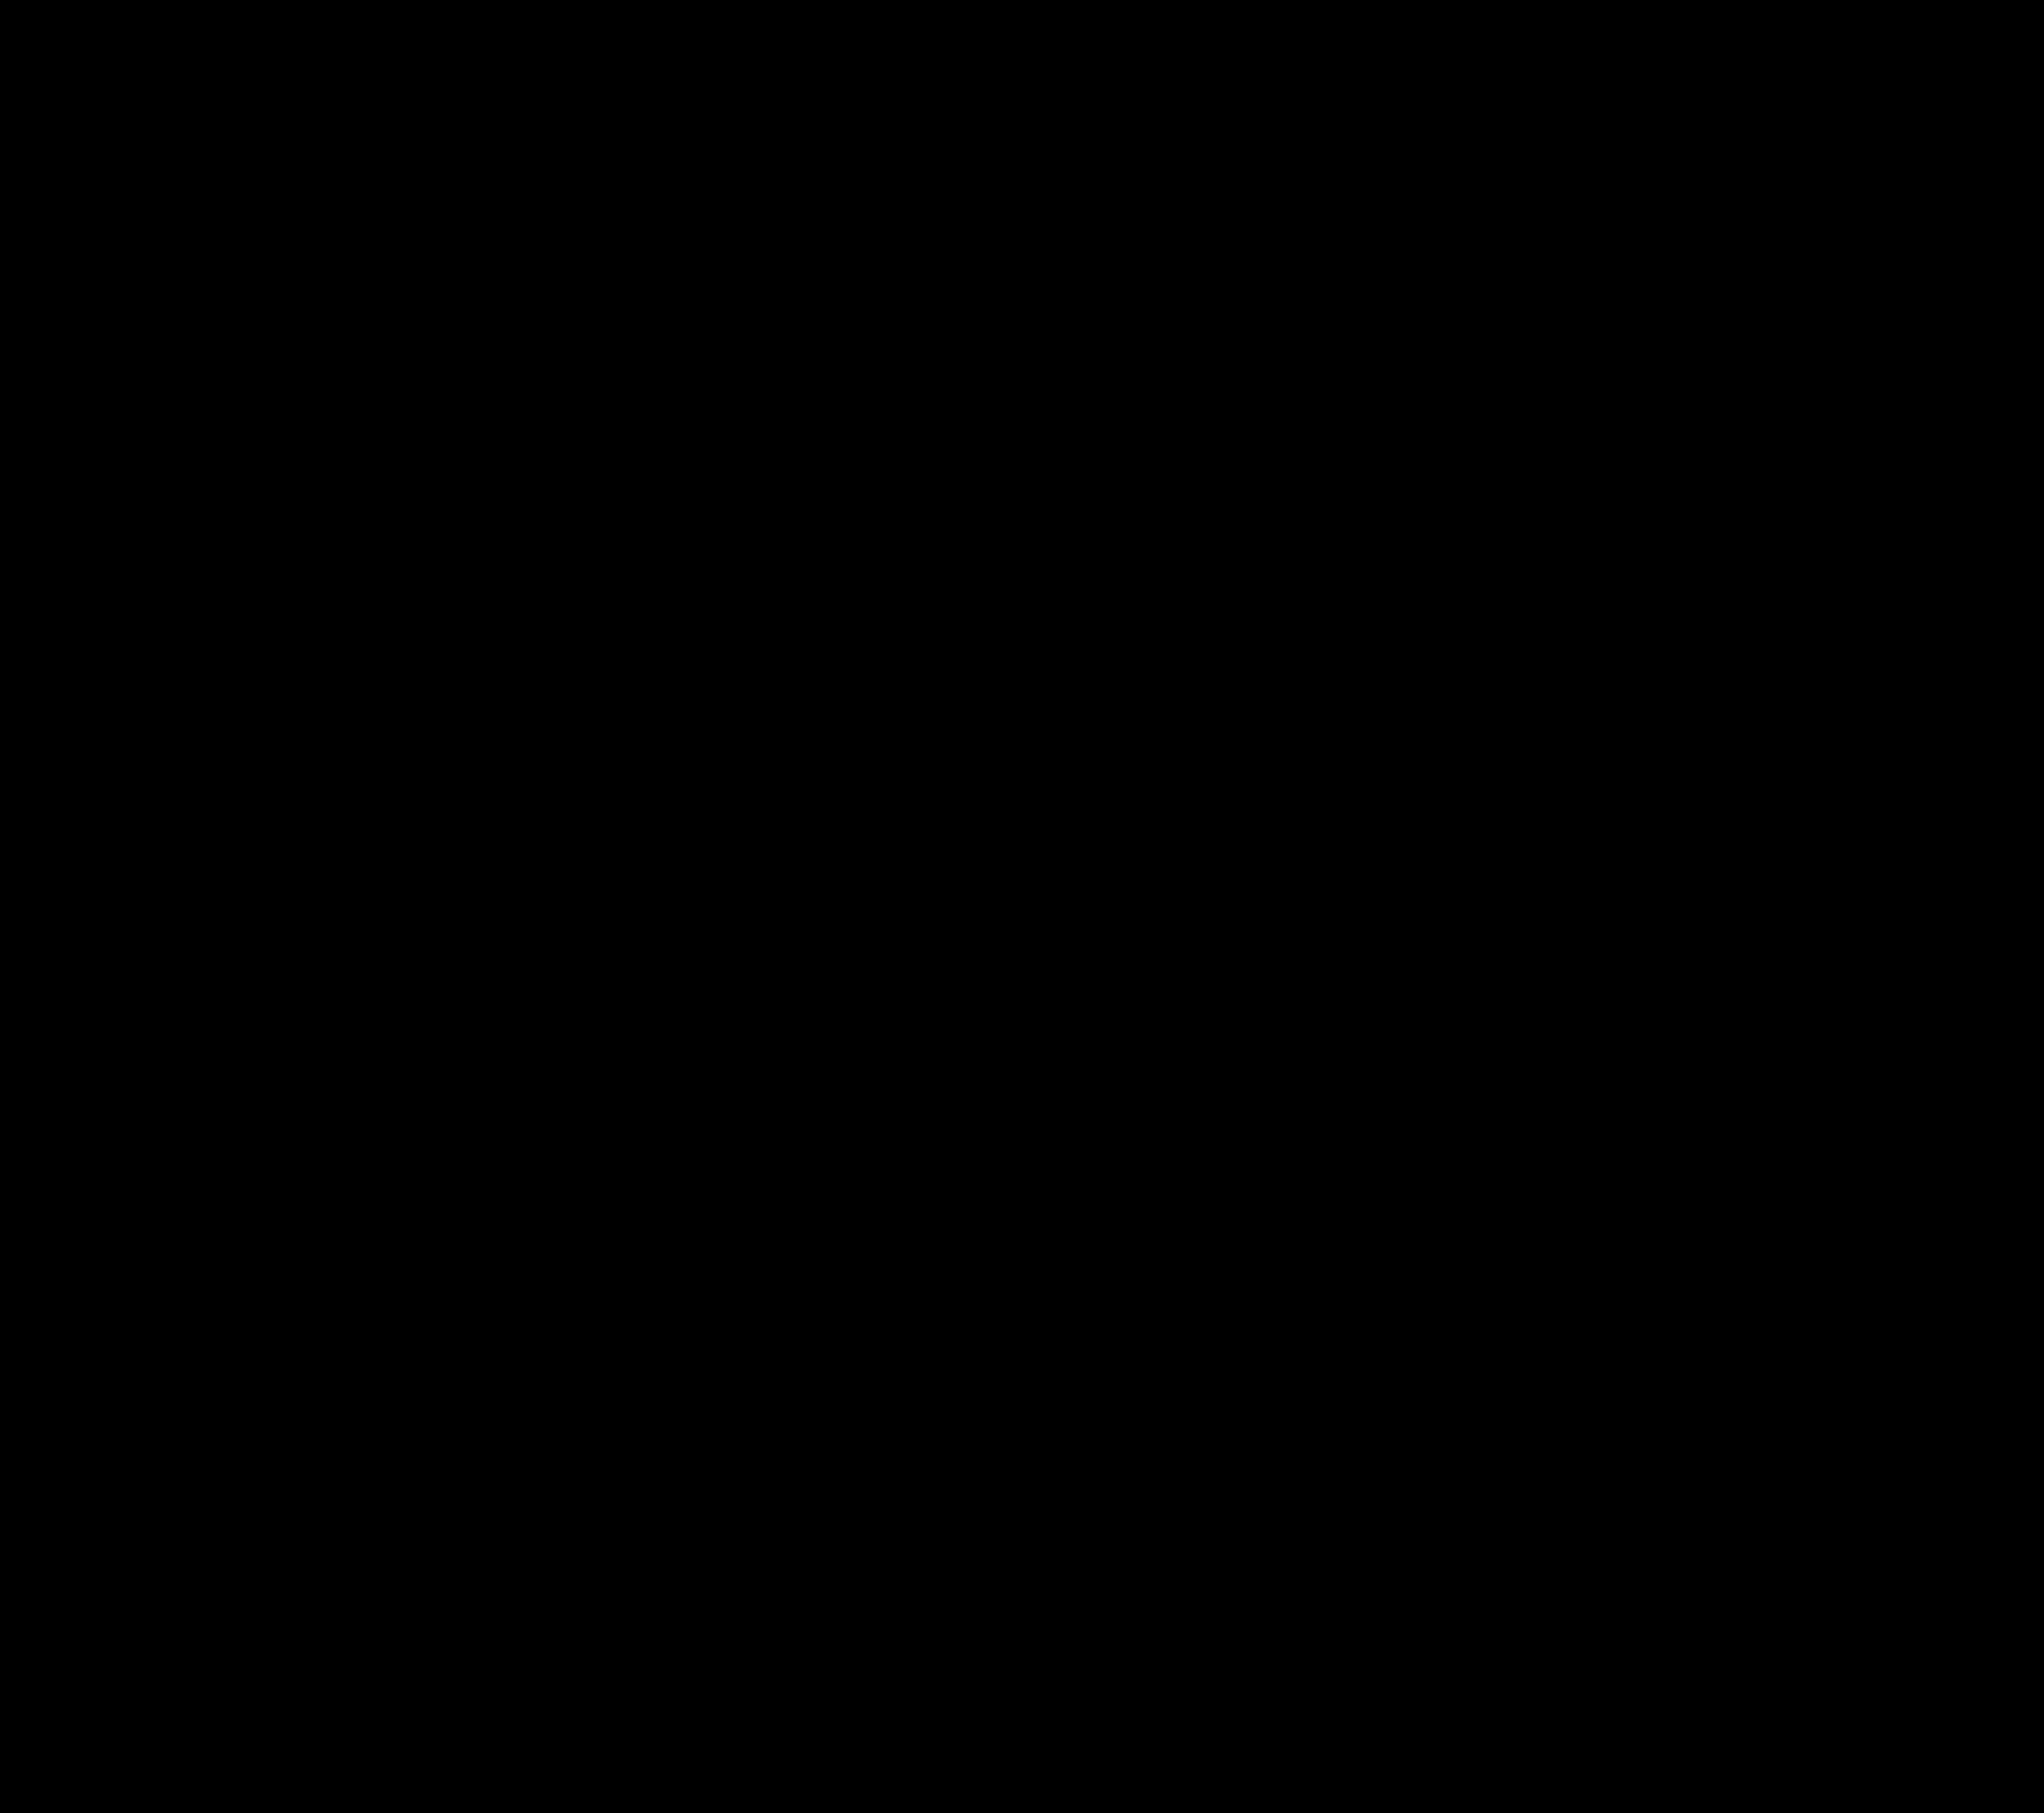 vector Line Drawing Of Cat at GetDrawings